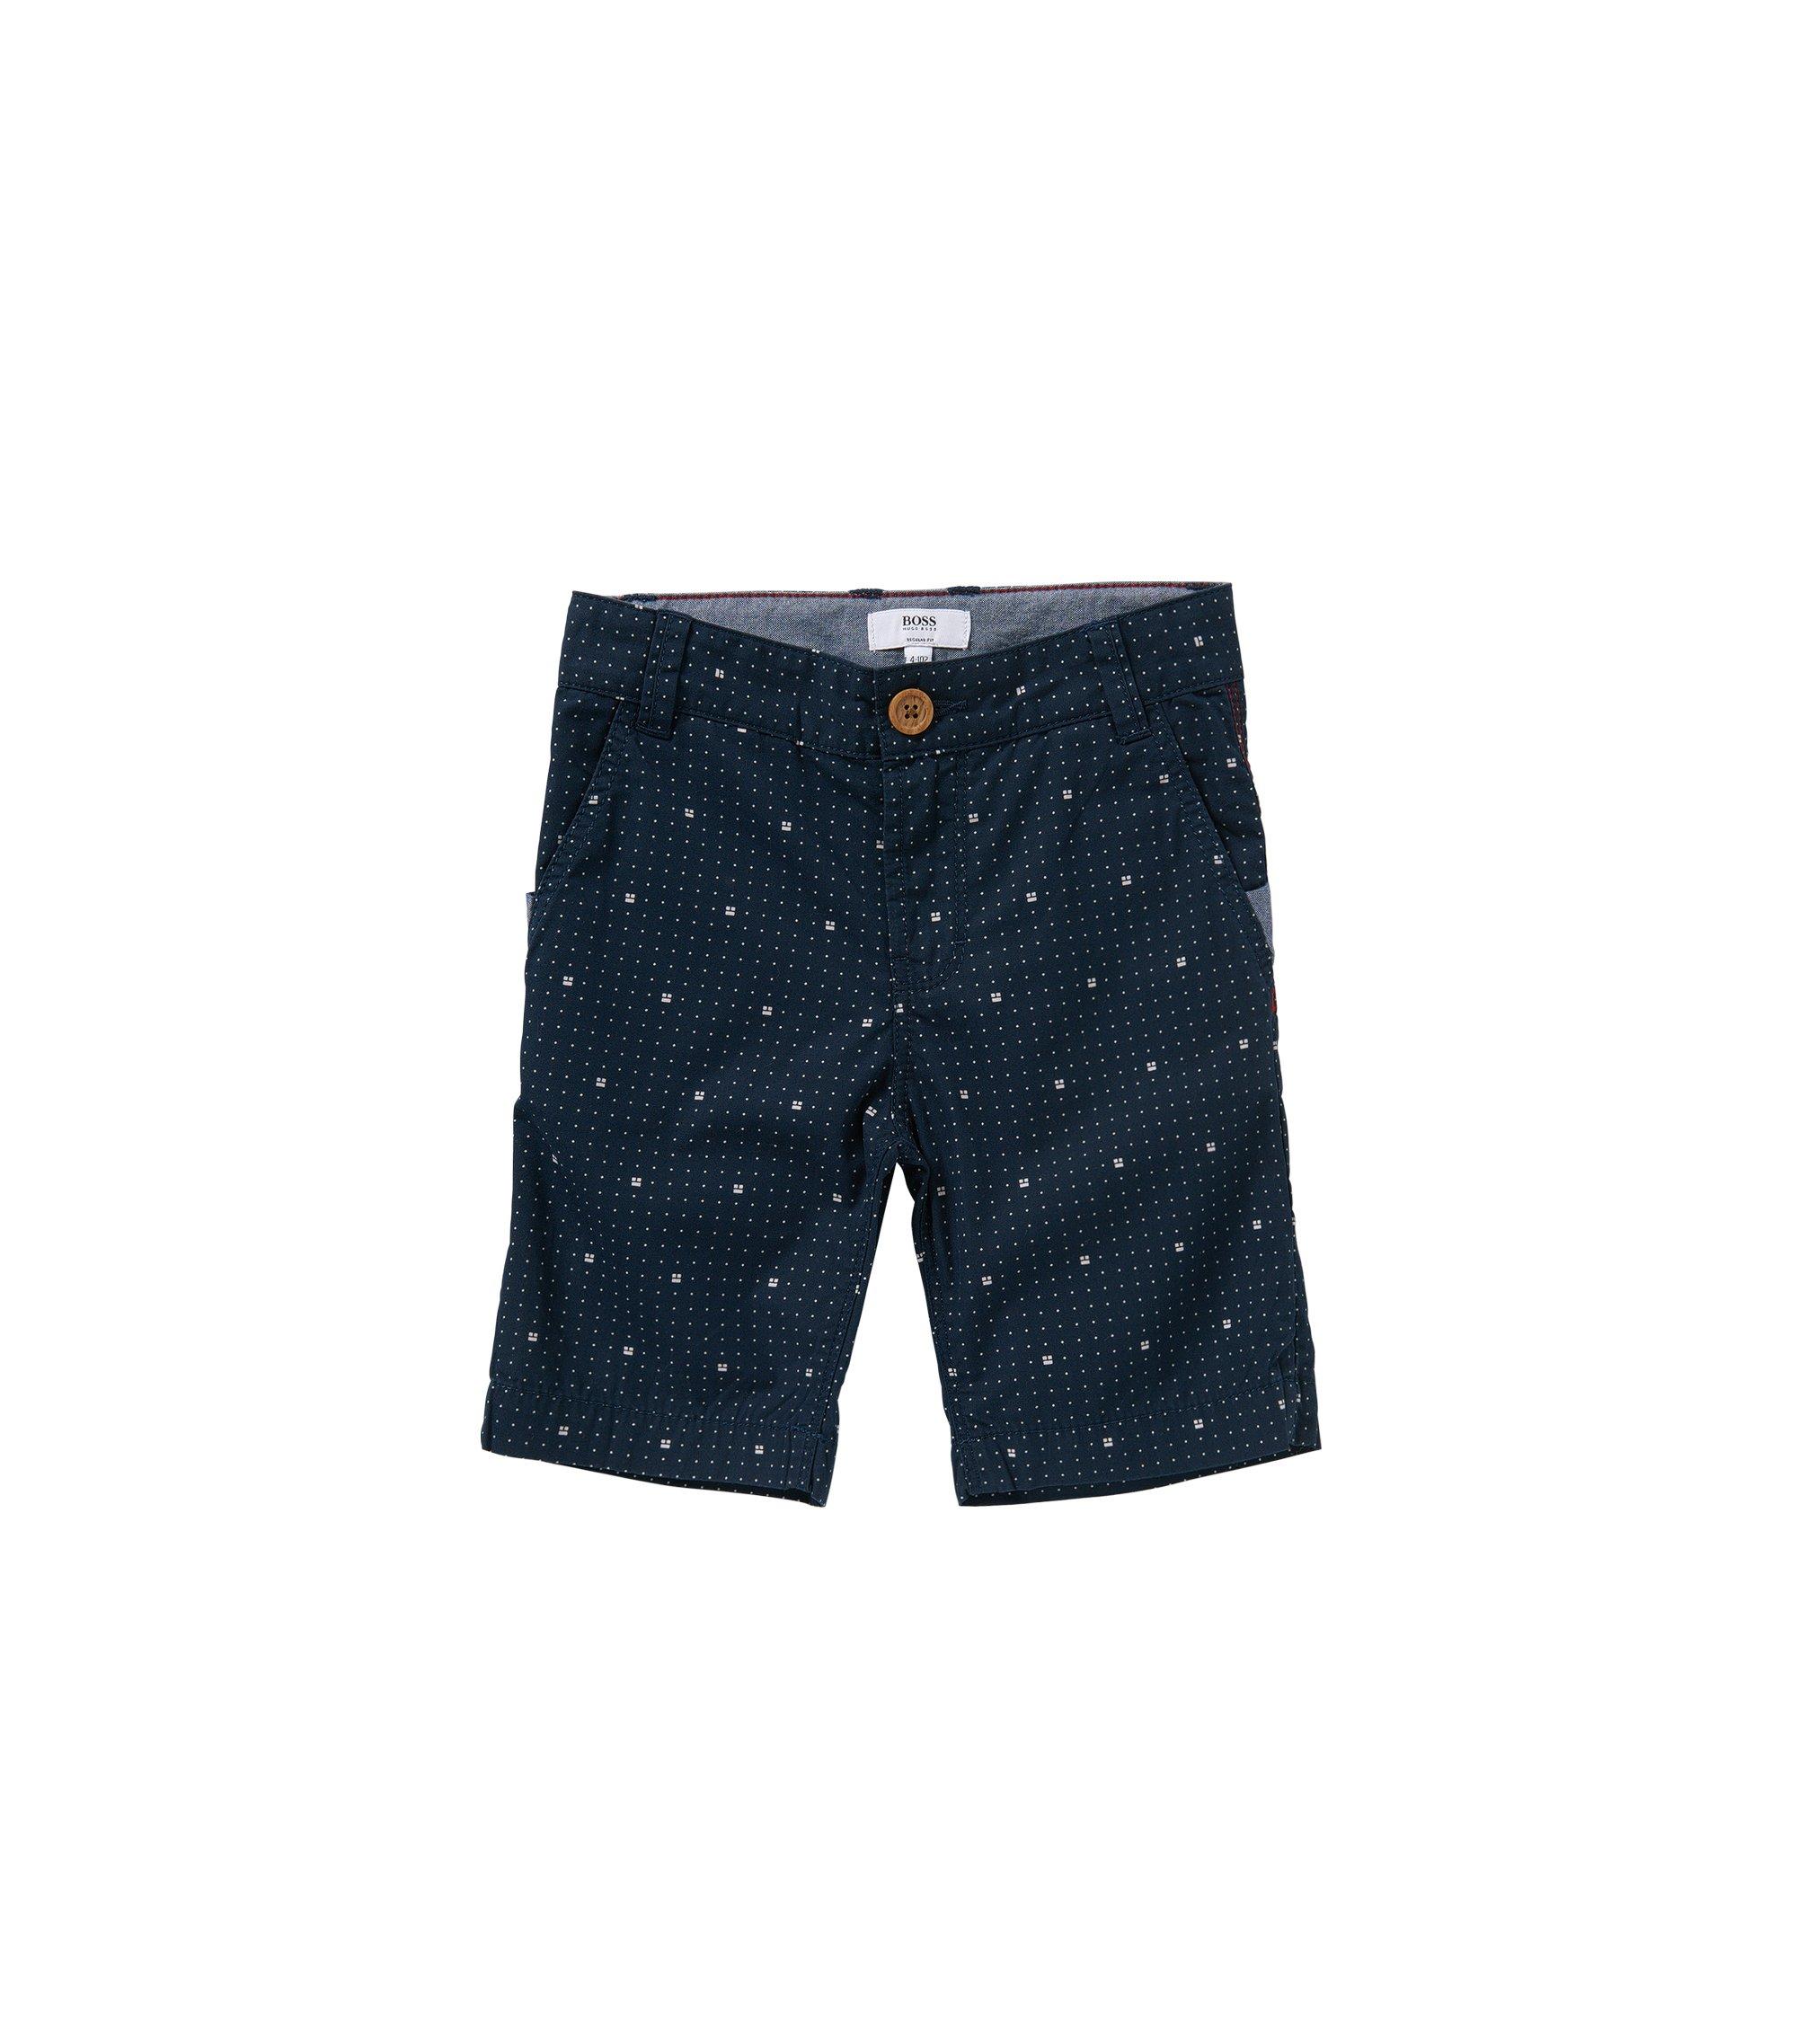 Regular-Fit Kids-Shorts aus gemusterter Baumwolle: 'J24408', Dunkelblau